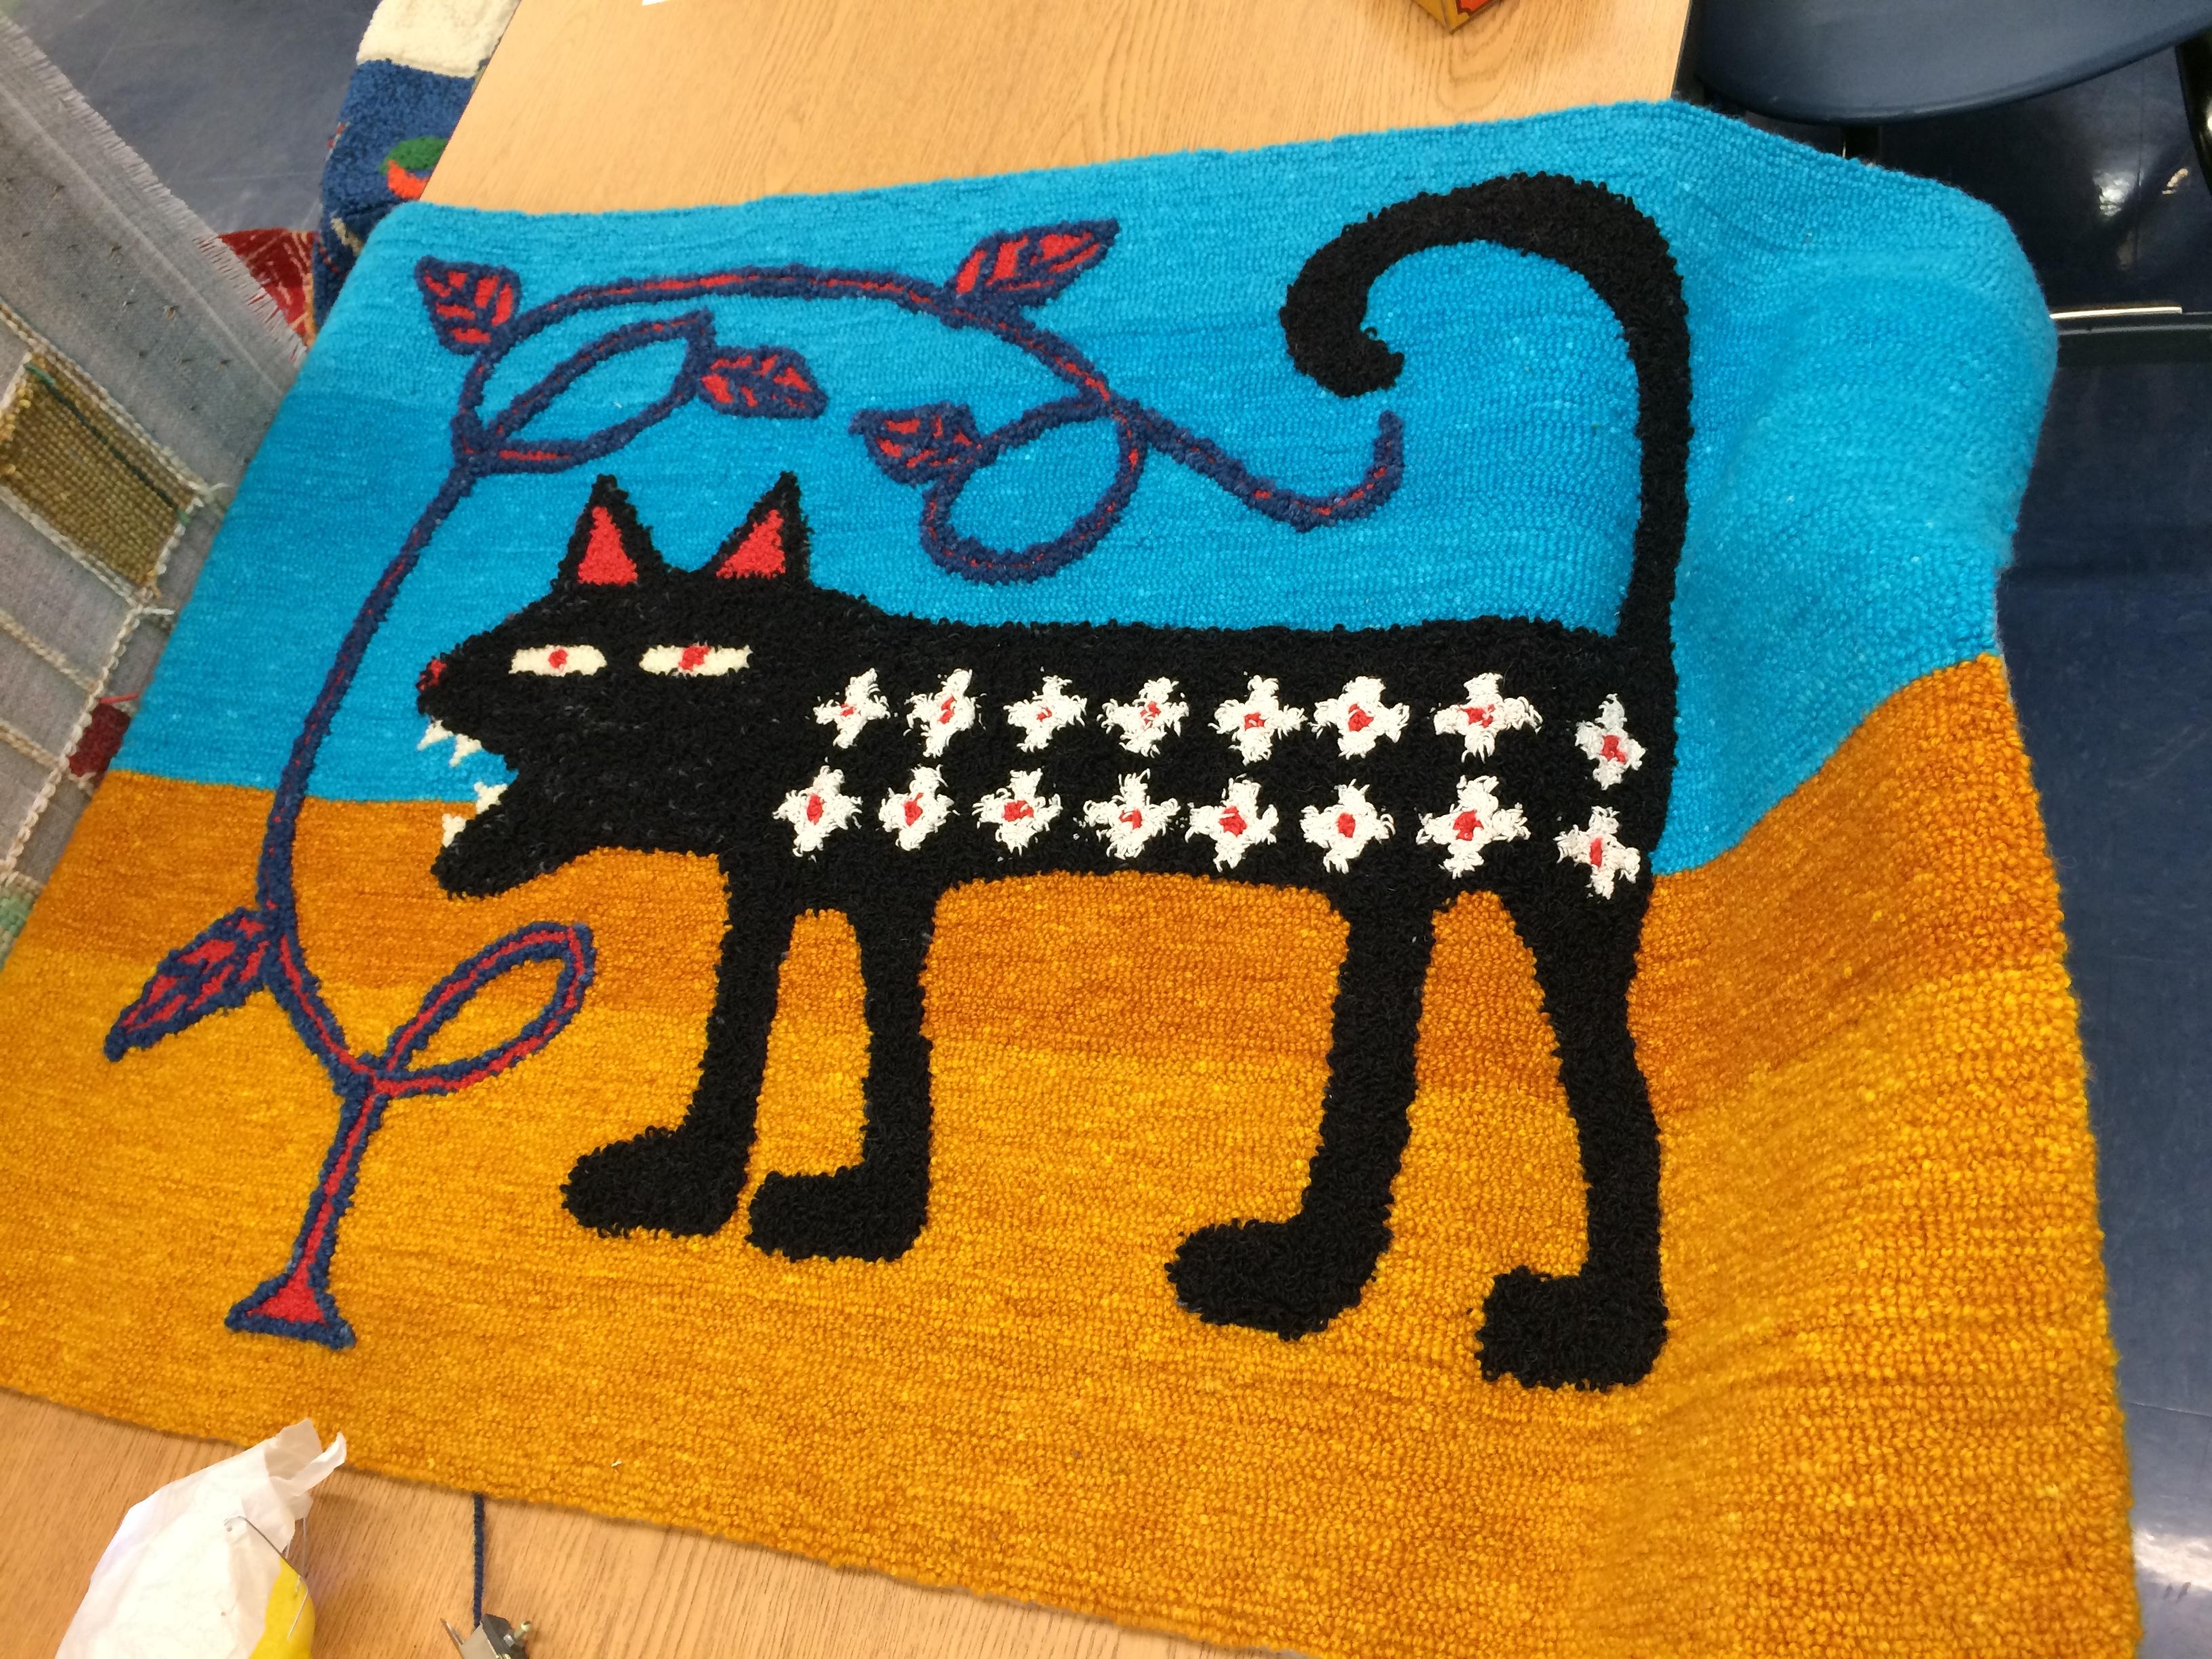 One of Michael Heilman's fantasy animal rugs